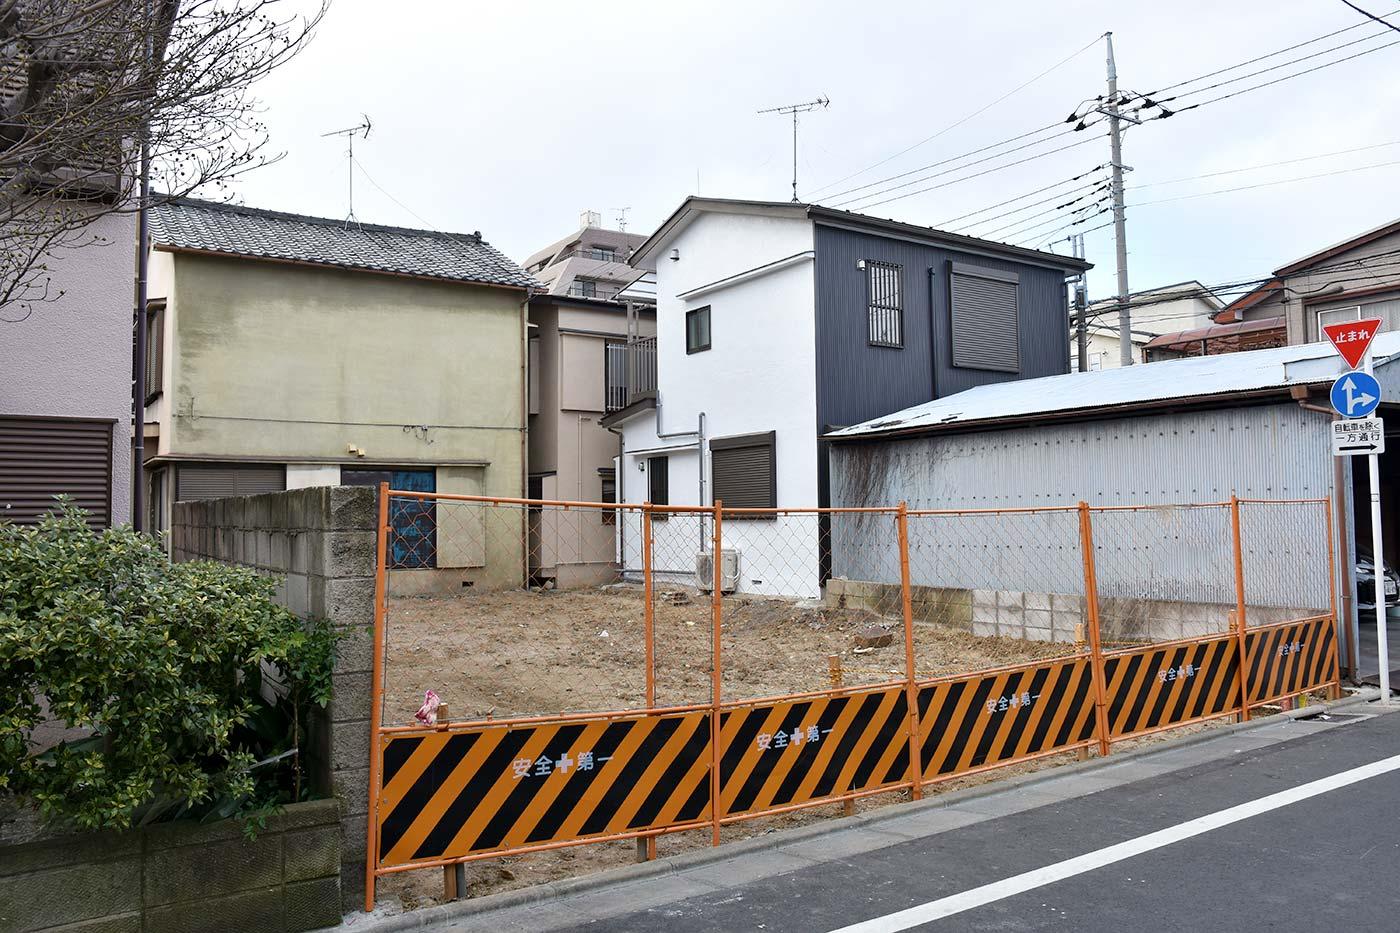 shinkoiwa_090